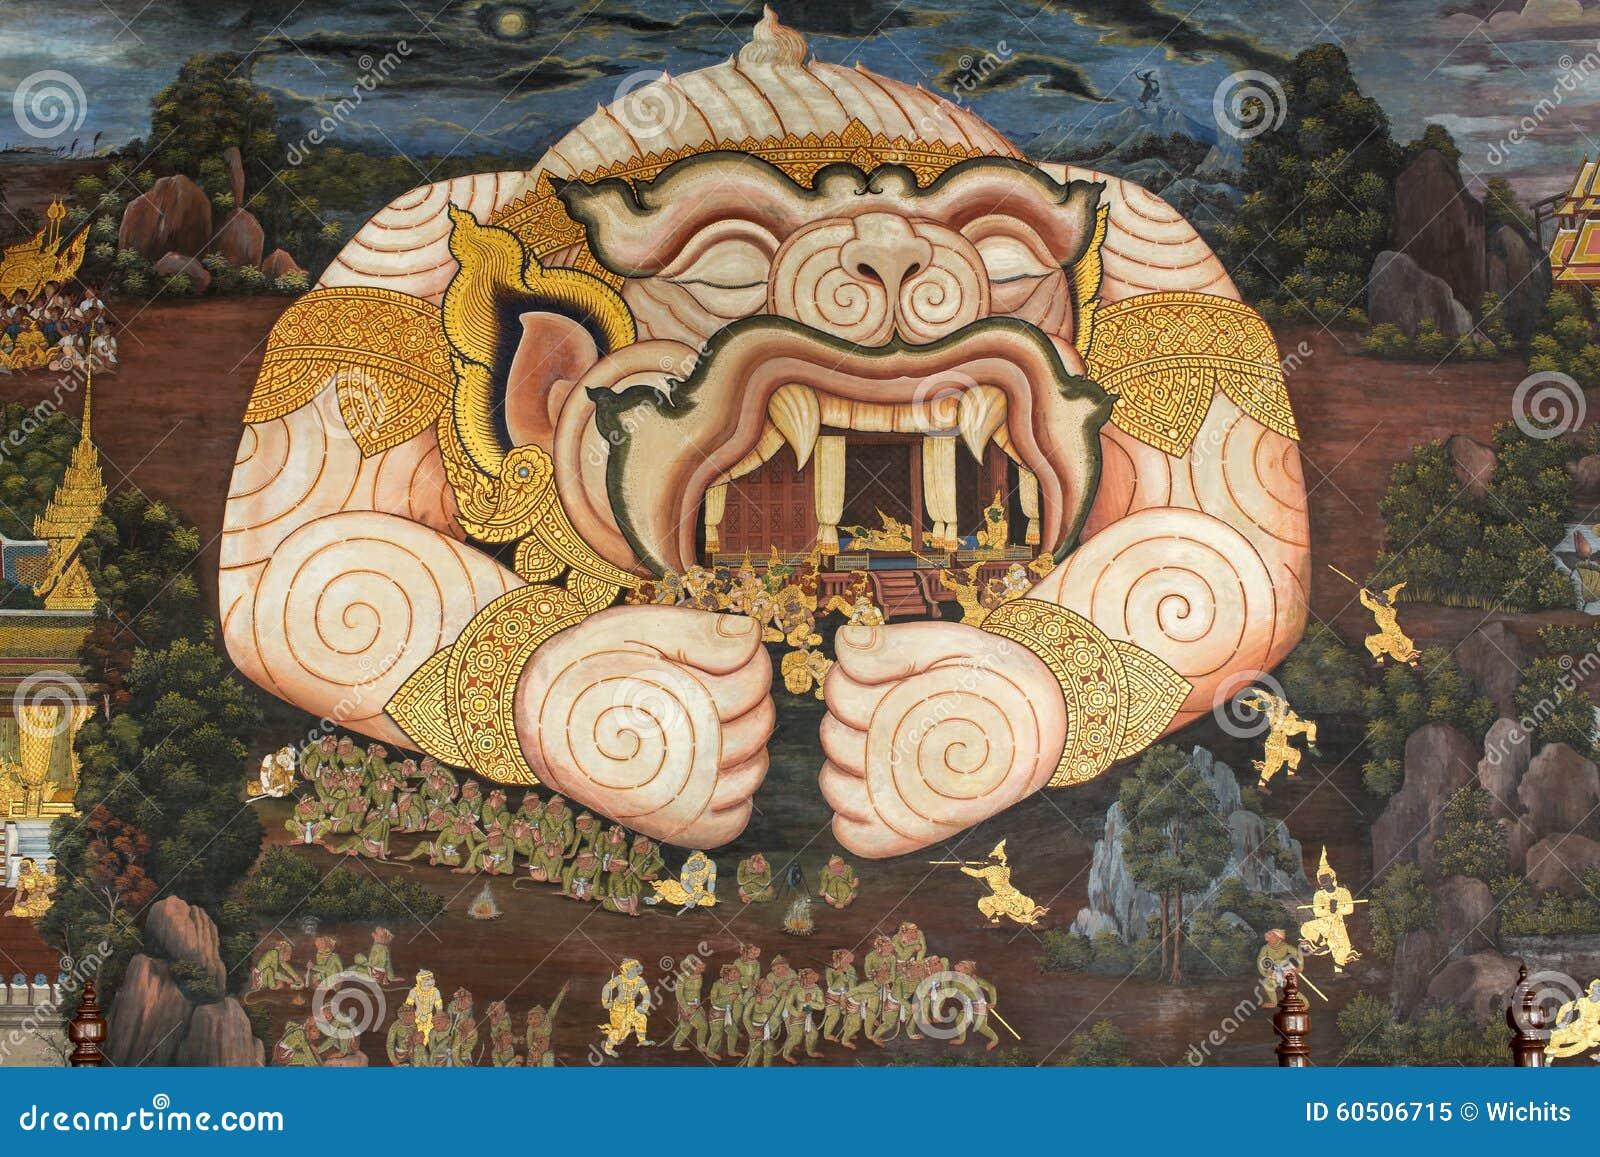 Mural painting royalty free stock image cartoondealer for Cartoon mural painting